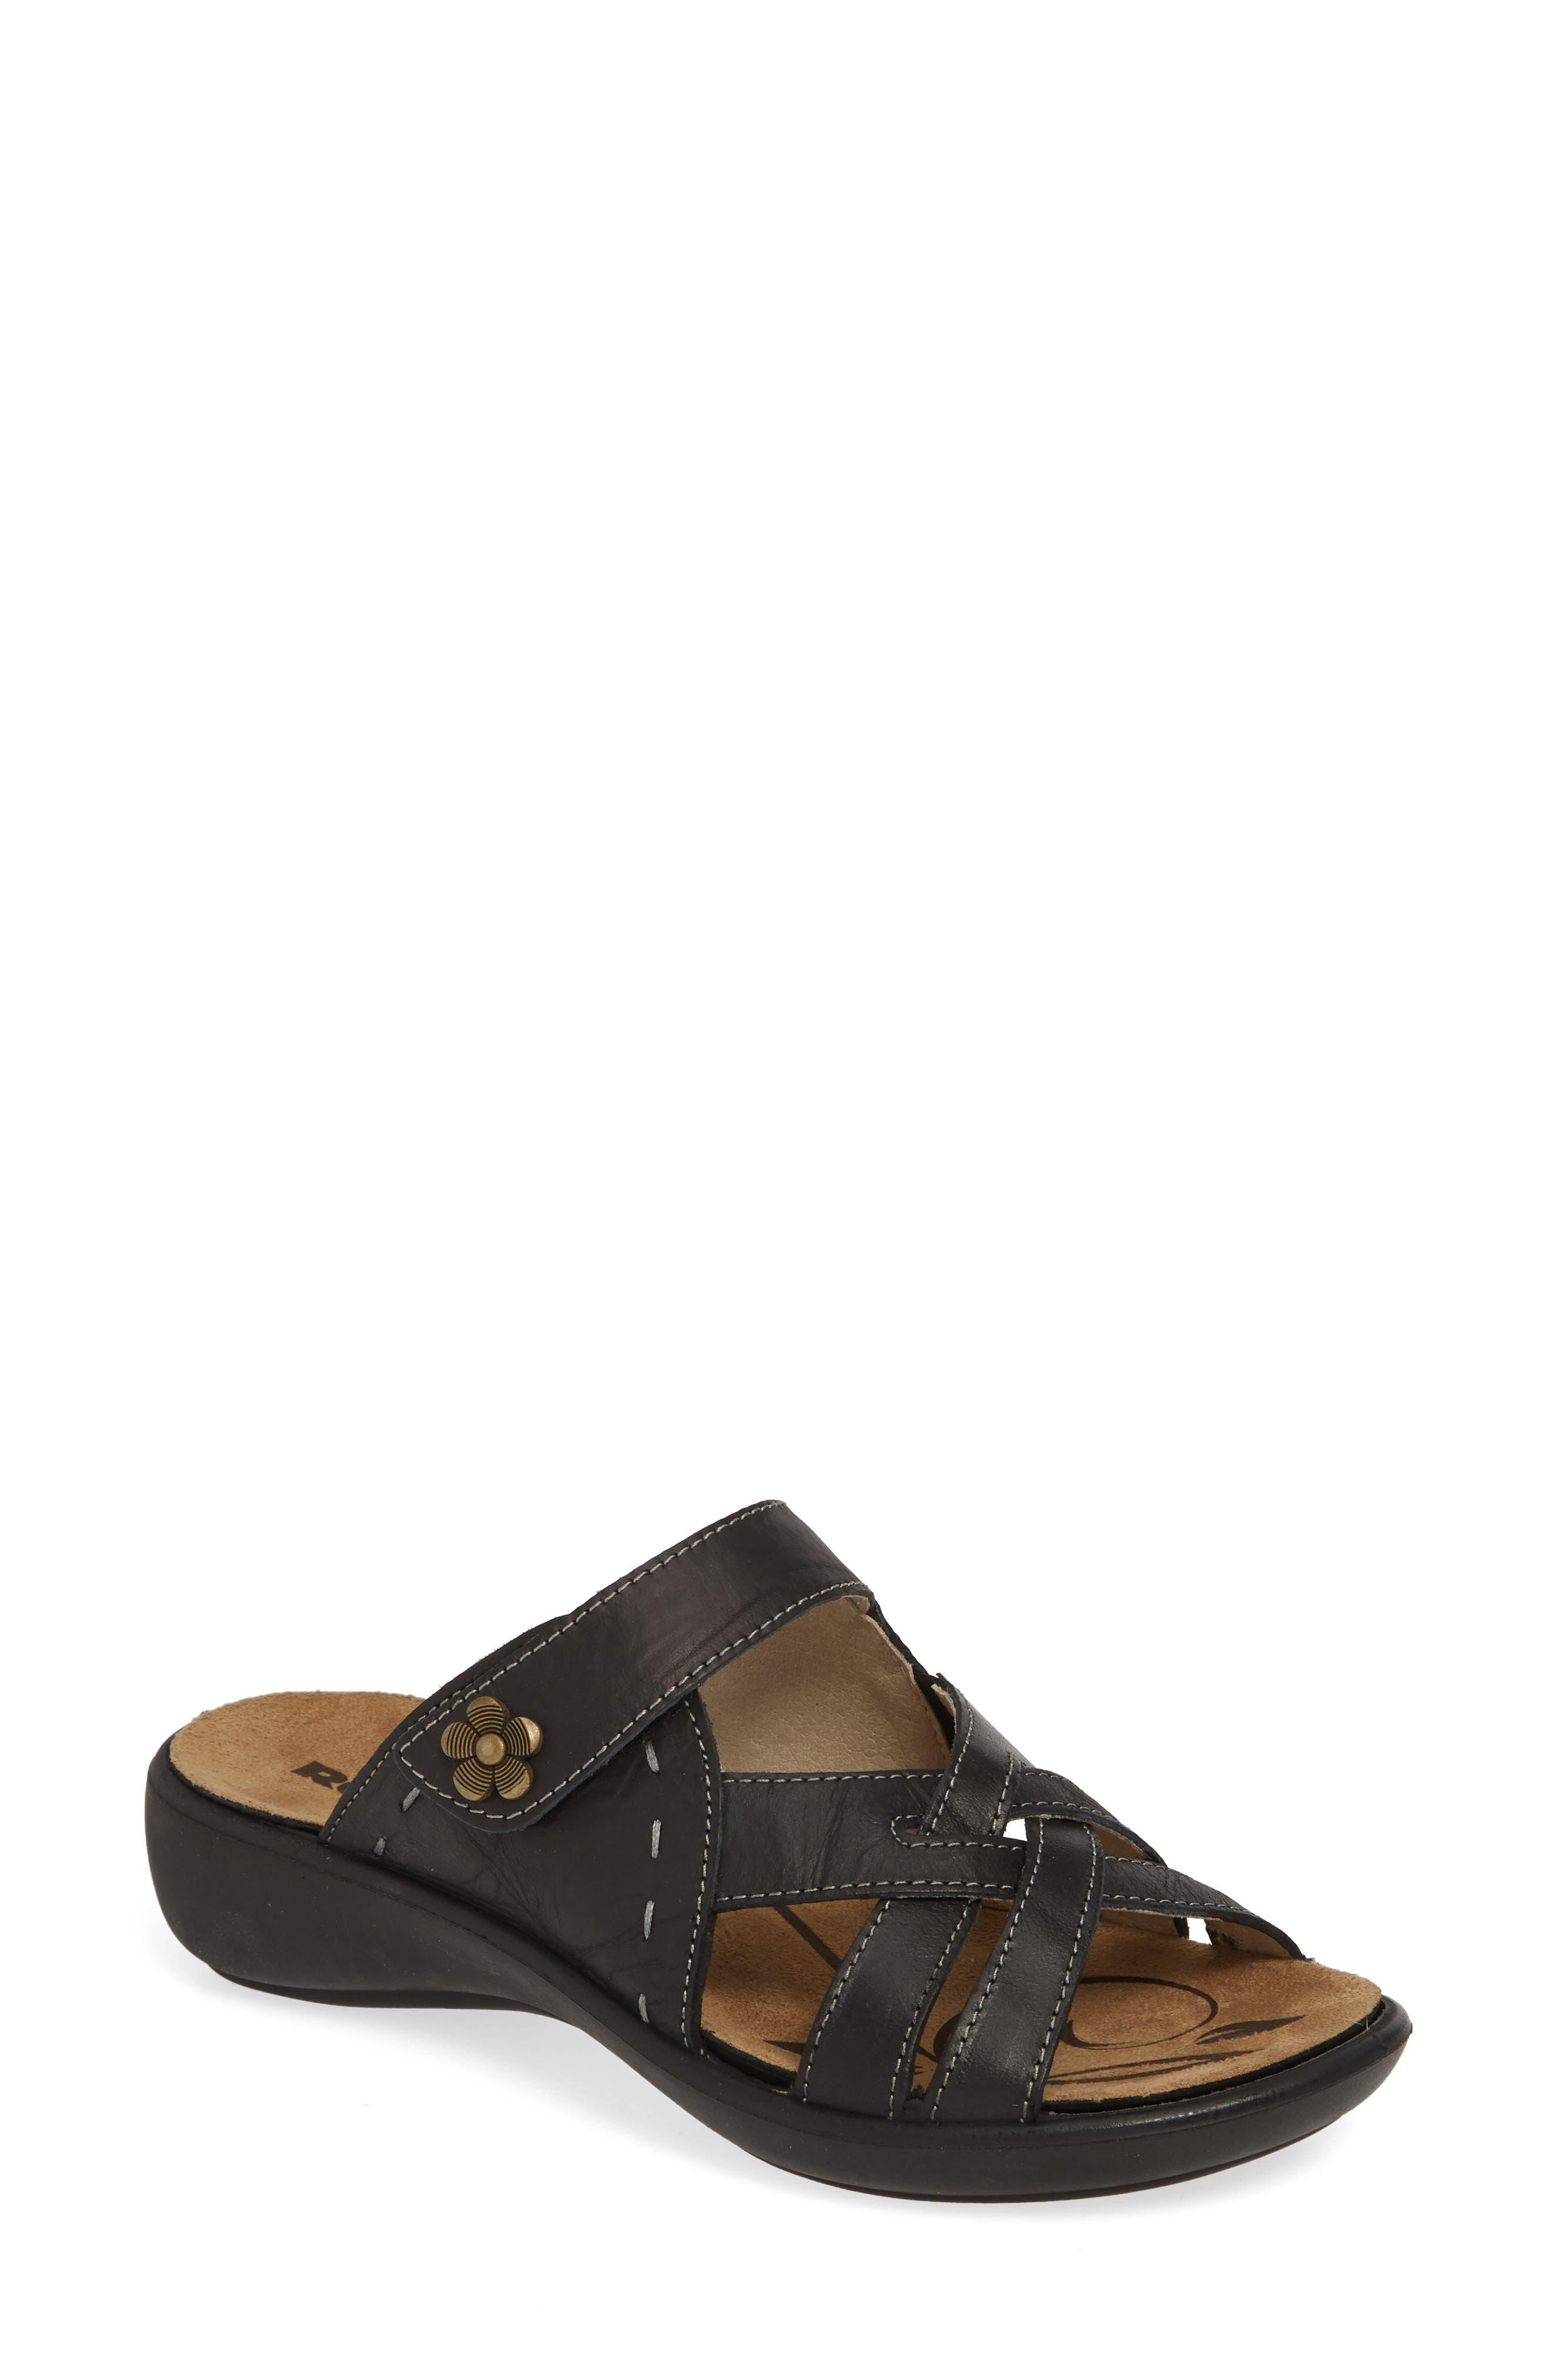 ROMIKA<SUP>®</SUP> Ibiza 99 Slide Sandal, Main, color, BLACK LEATHER